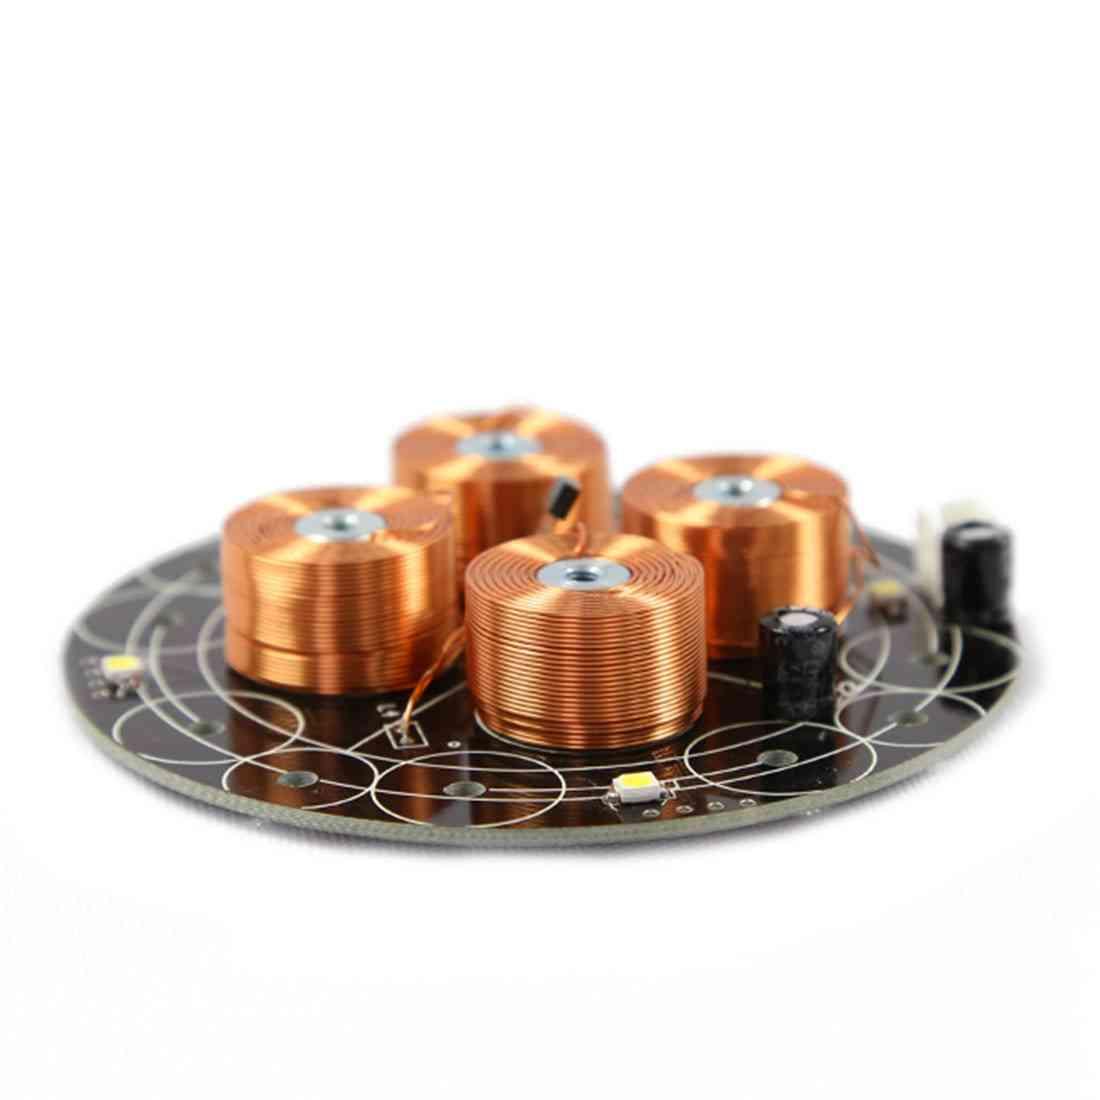 Magnetic Levitation Module Diy Maglev Furnishing Articles Kit